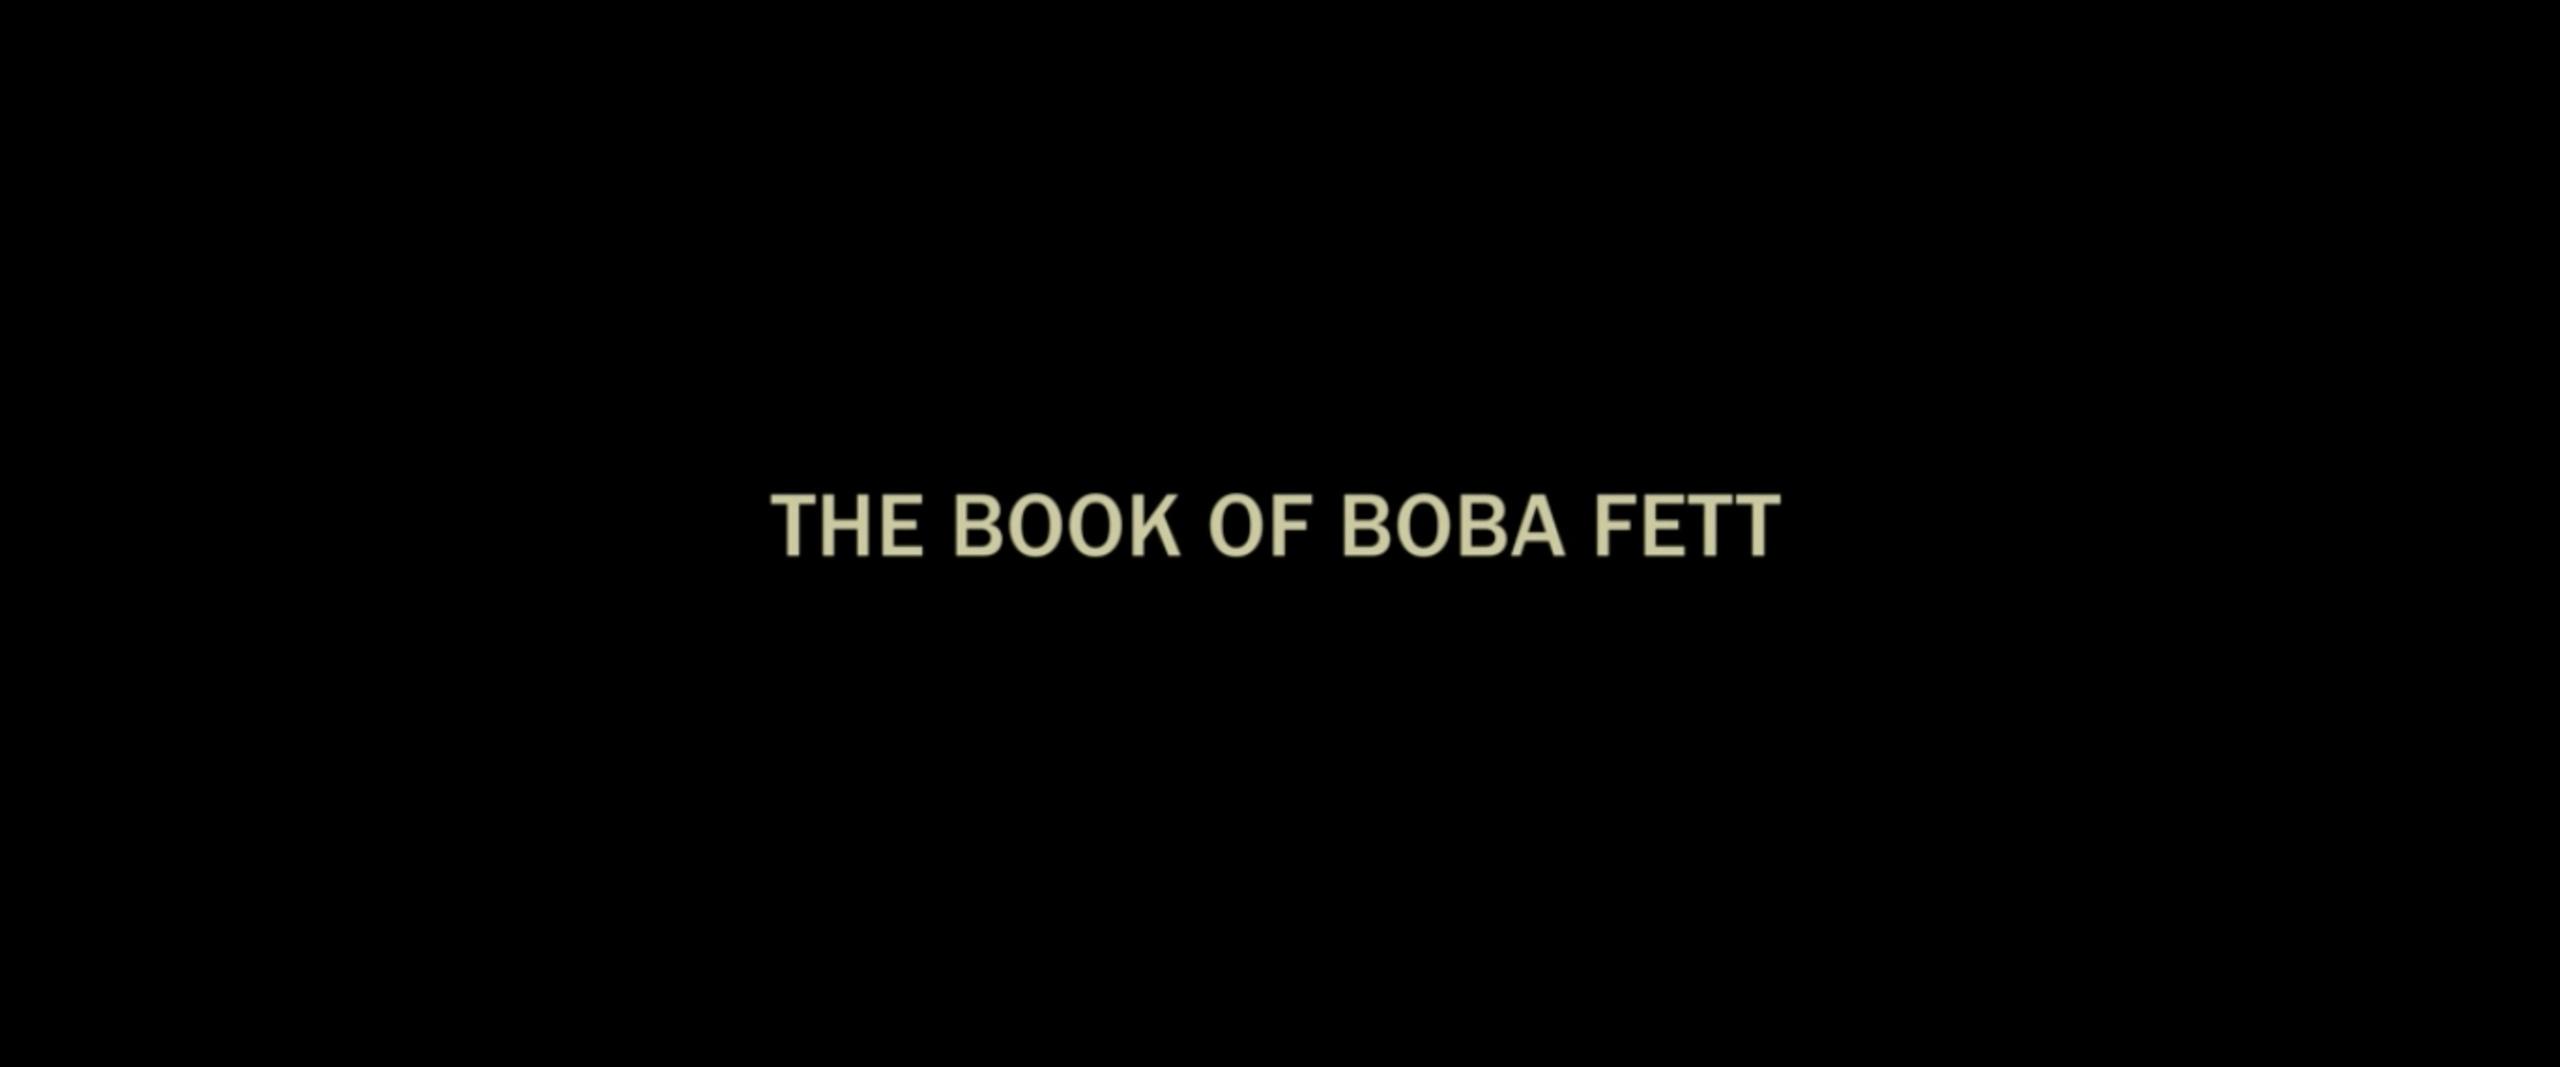 Что такое «Книга Бобы Фетта» (The Book of Boba Fett)?